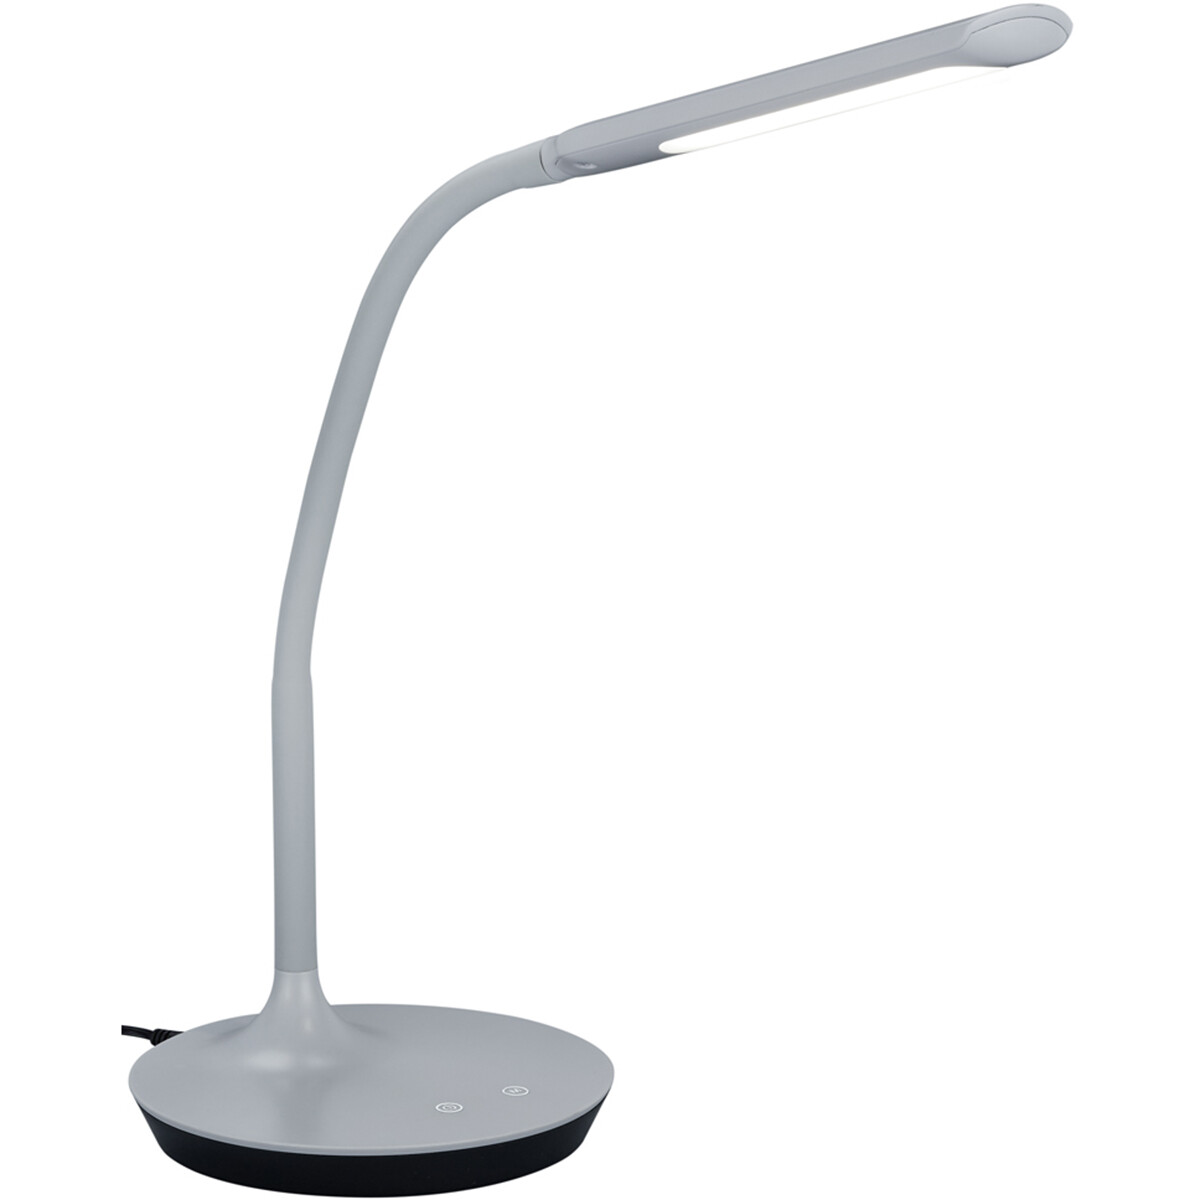 LED Tafellamp - Trion Polina - 5W - Aanpasbare Kleur - Dimbaar - Rond - Mat Grijs - Kunststof